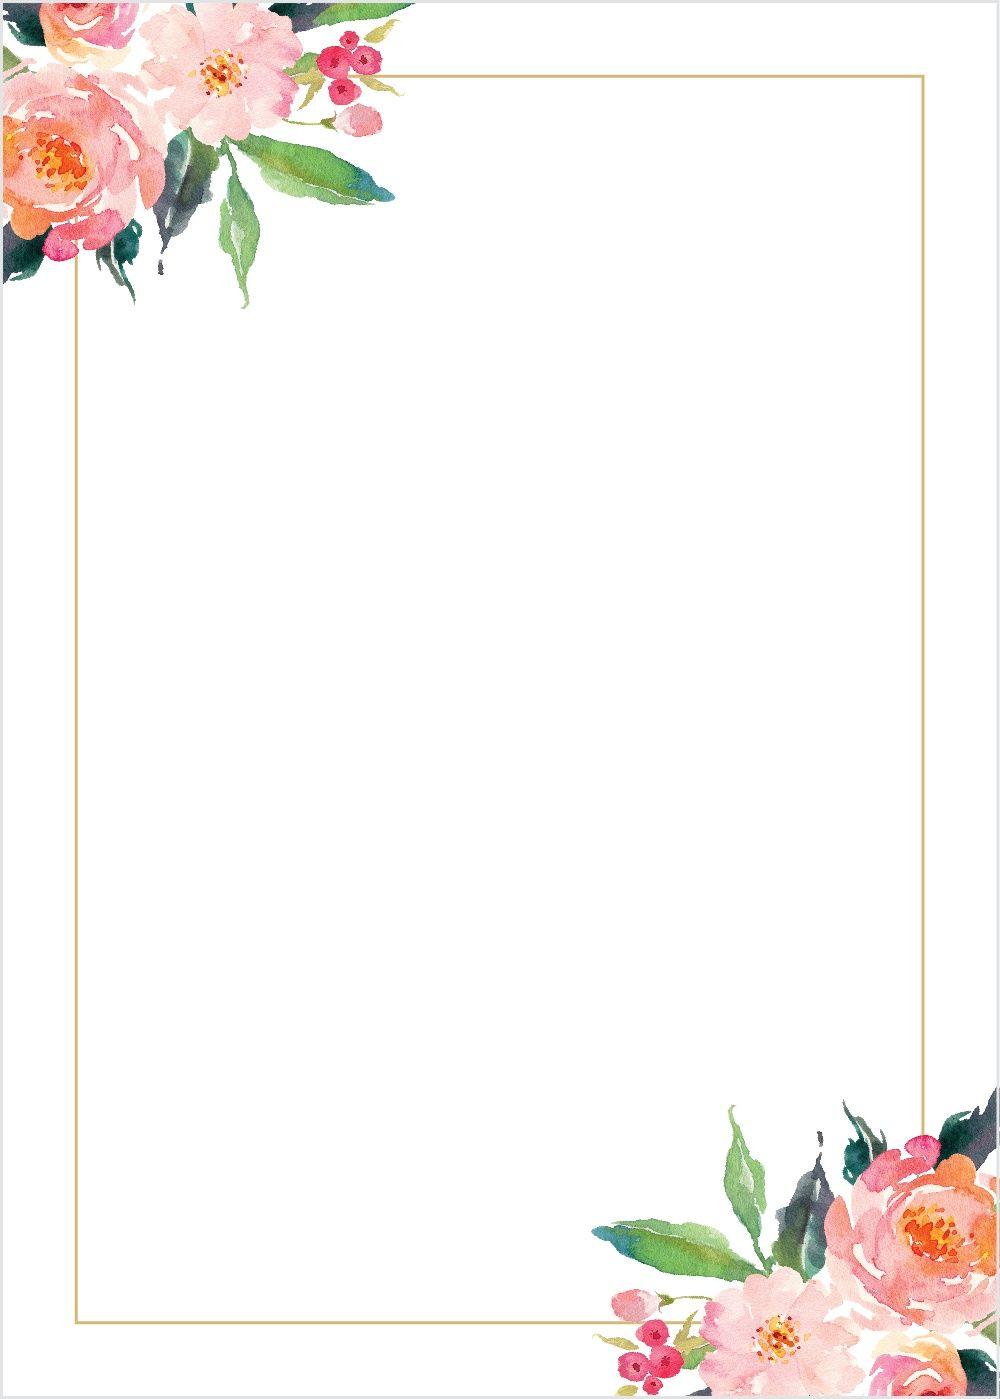 Standing Ovation Foil Wedding Invitations | quincenera | Pinterest ...